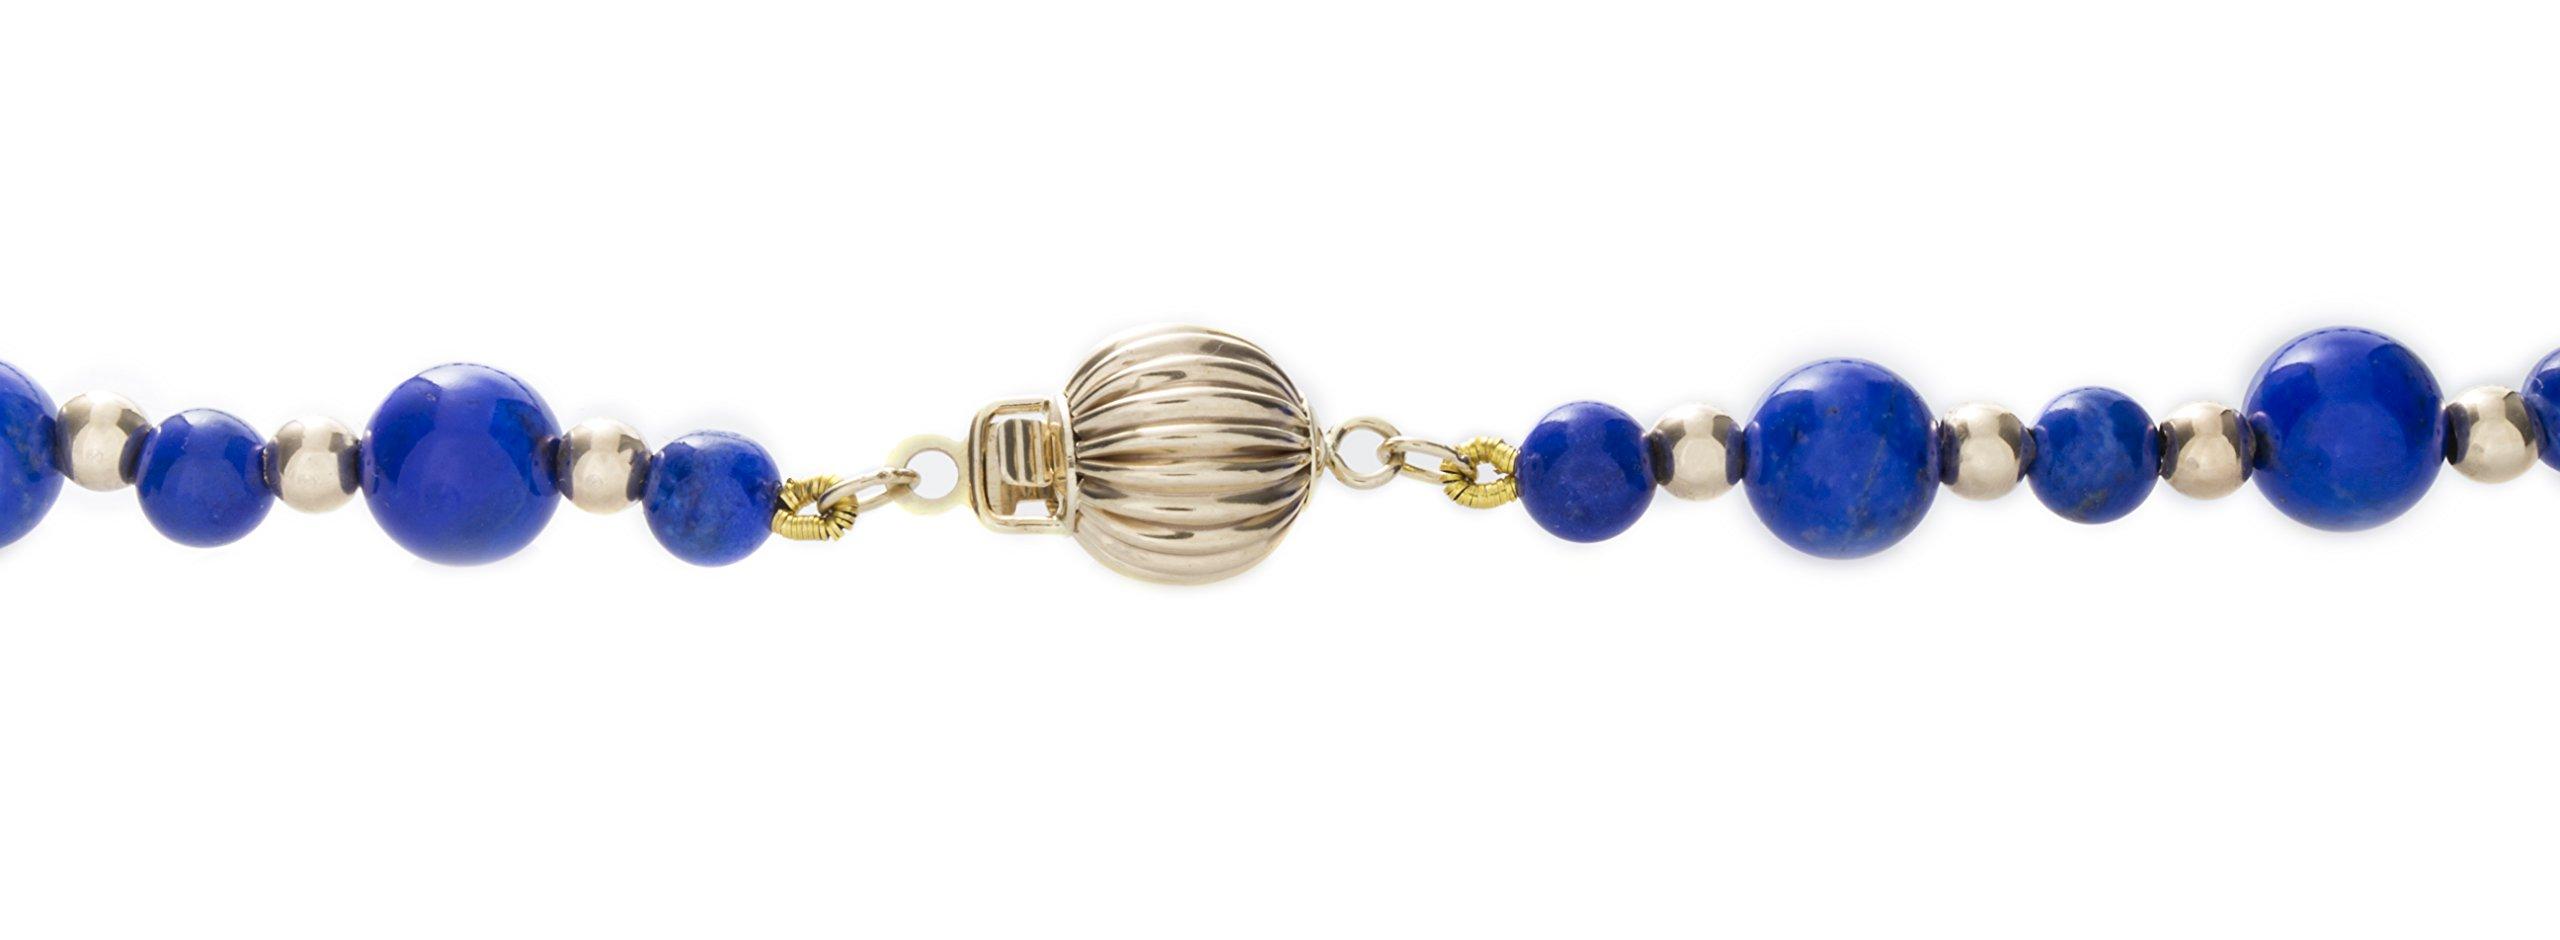 ISAAC WESTMAN 14K Yellow Gold Graduated Lapis Lazuli Gemstone Beaded Necklace | 20'' Matinee Length by ISAAC WESTMAN (Image #4)